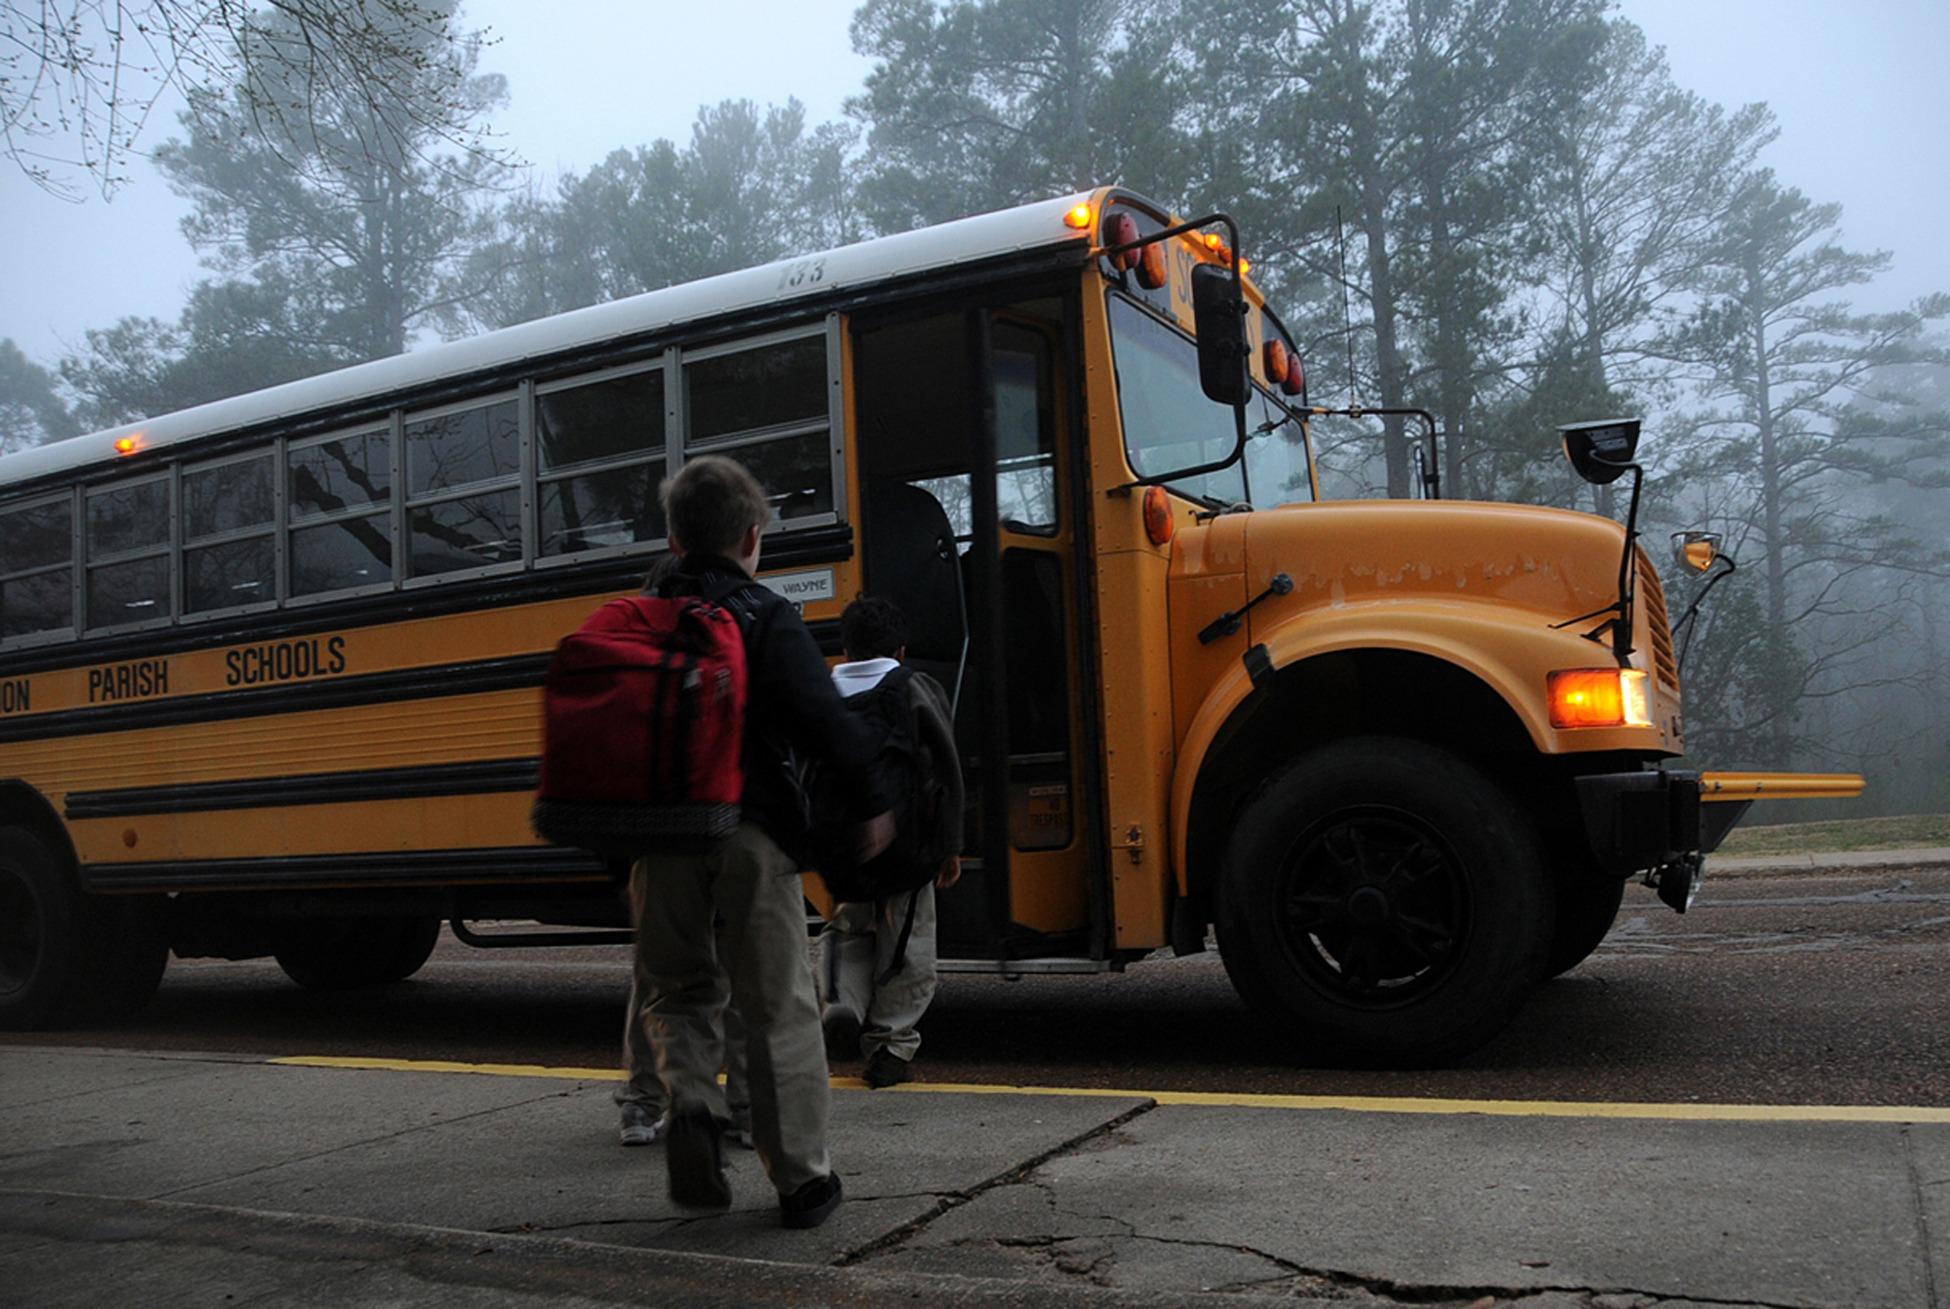 Canva - Kids Riding the School Bus